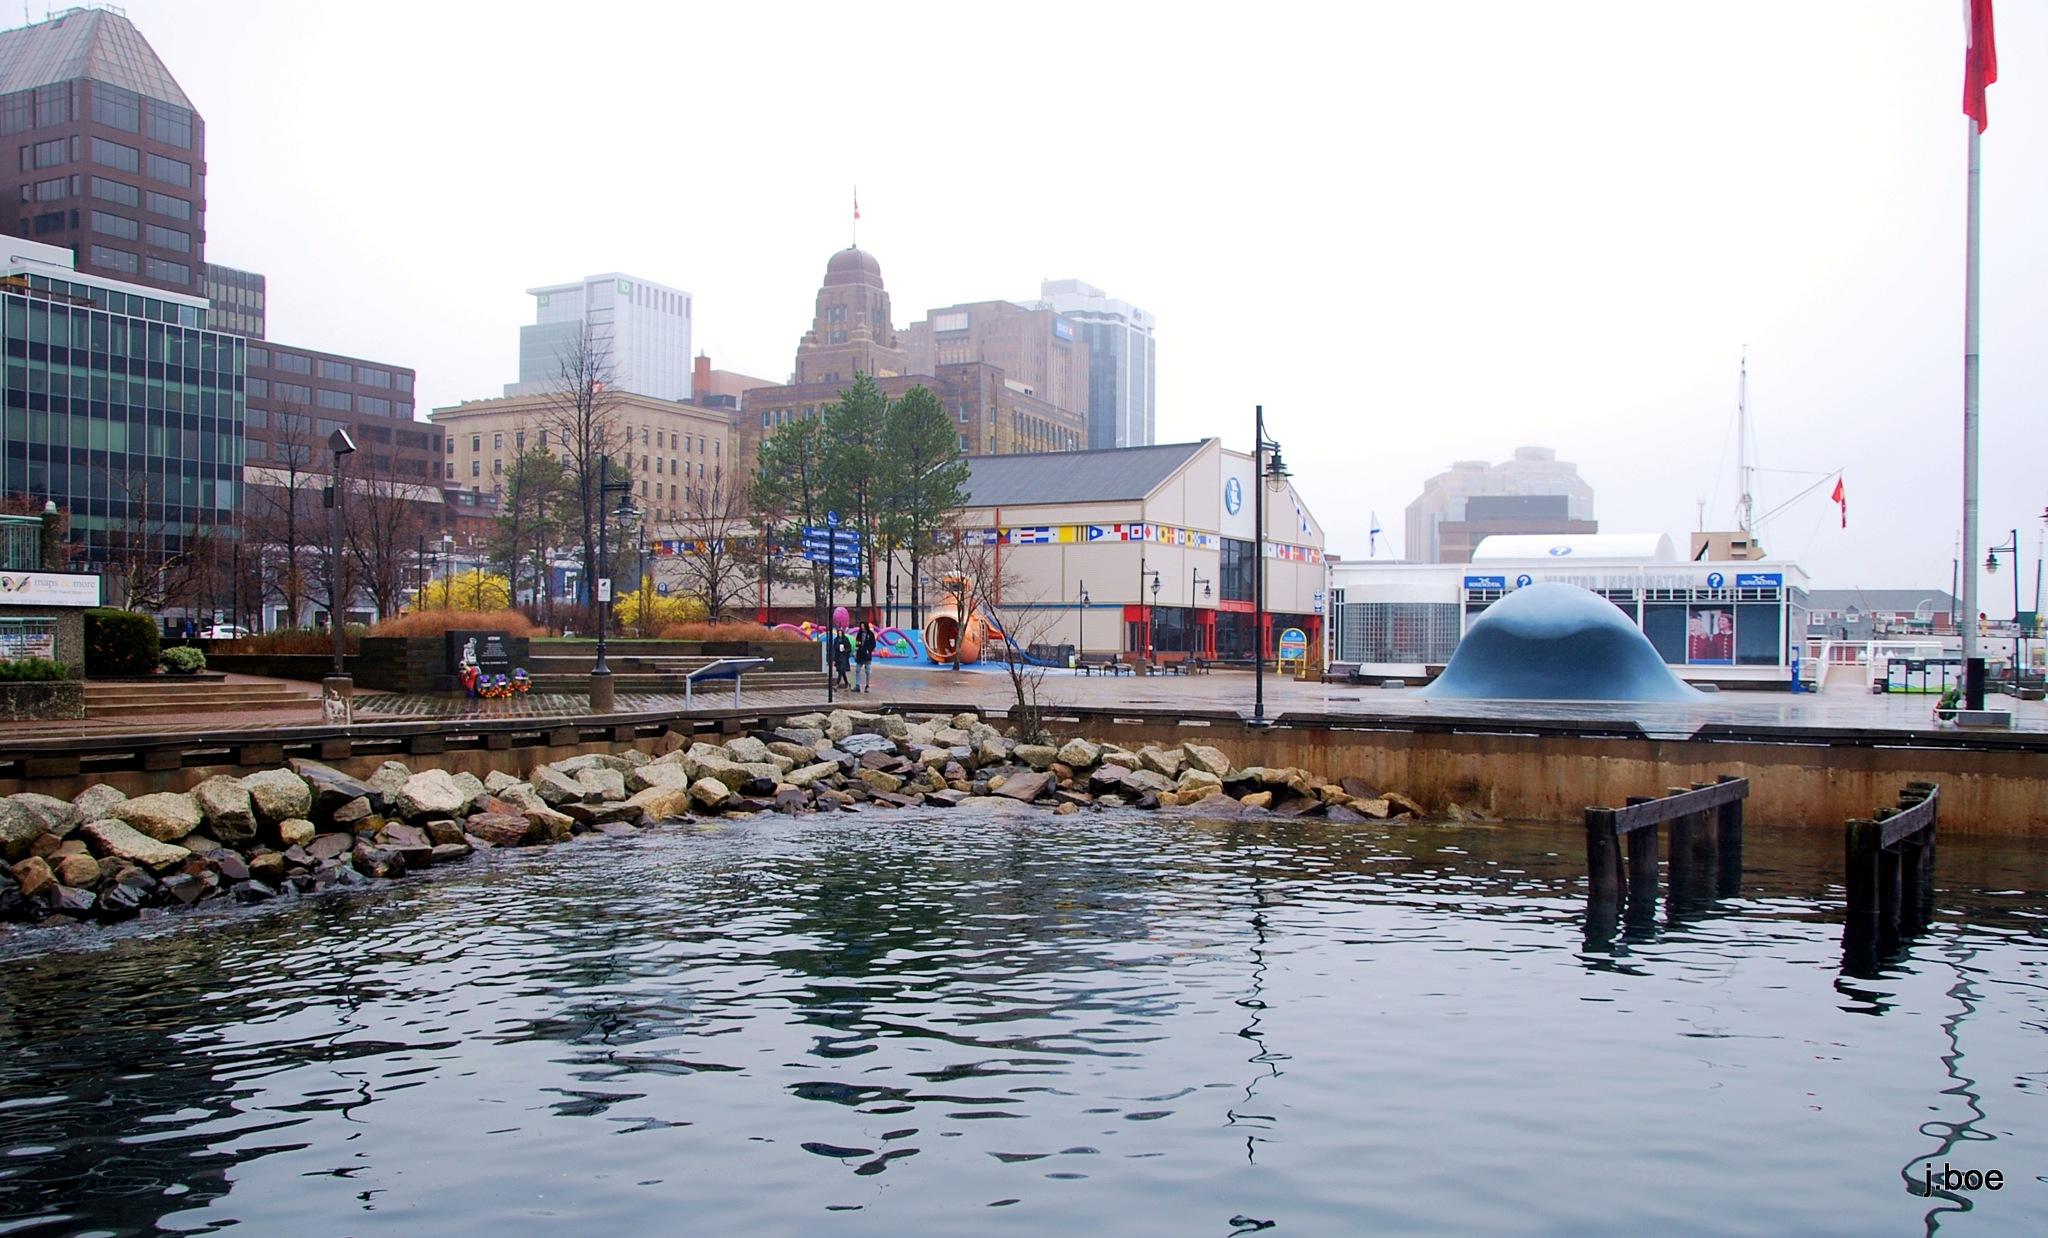 2016.05.06 - waterfront  by j.boe